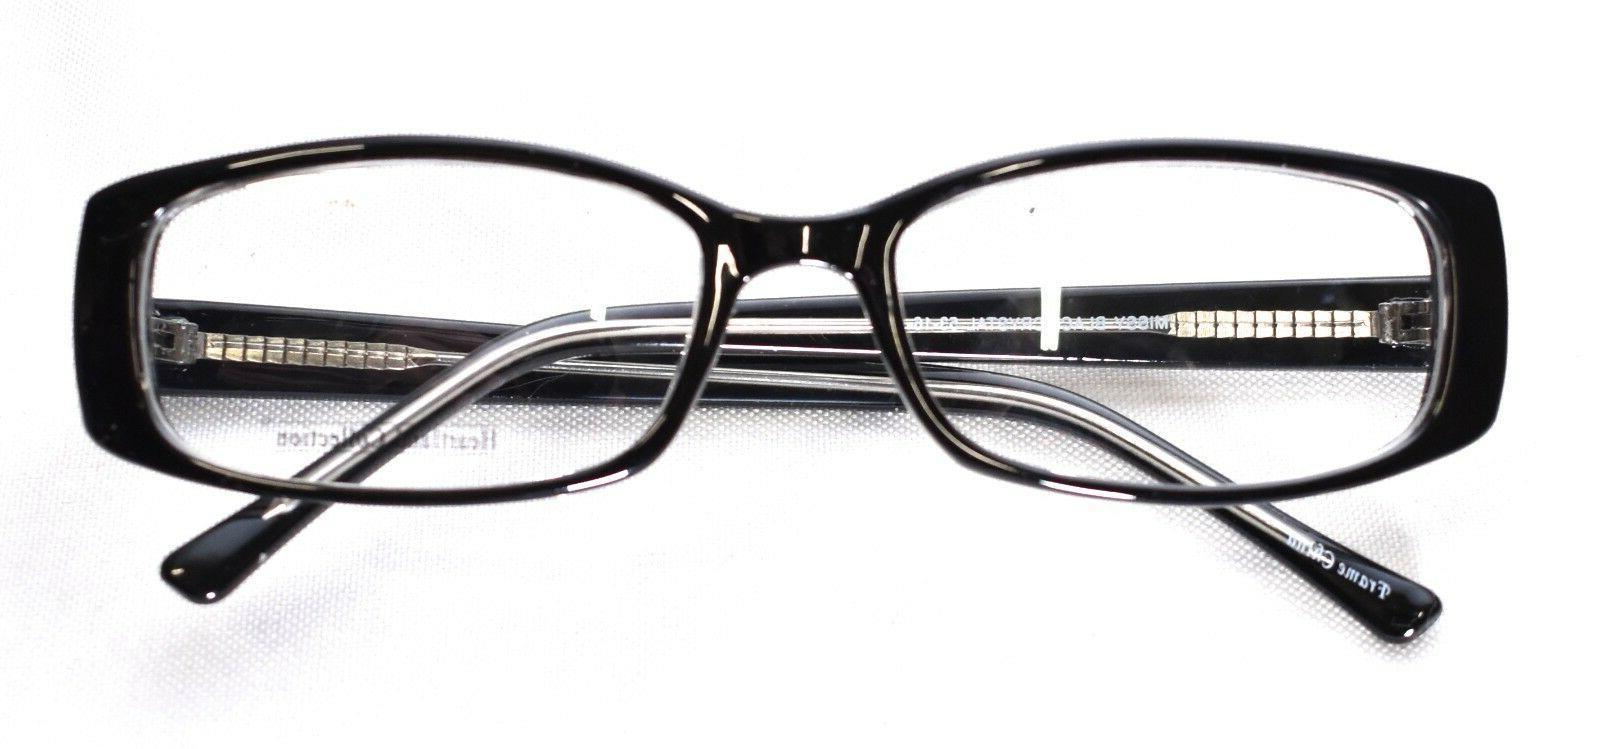 Set of Collection Tortoise Eyeglass/Glasses Frames 53-16-135